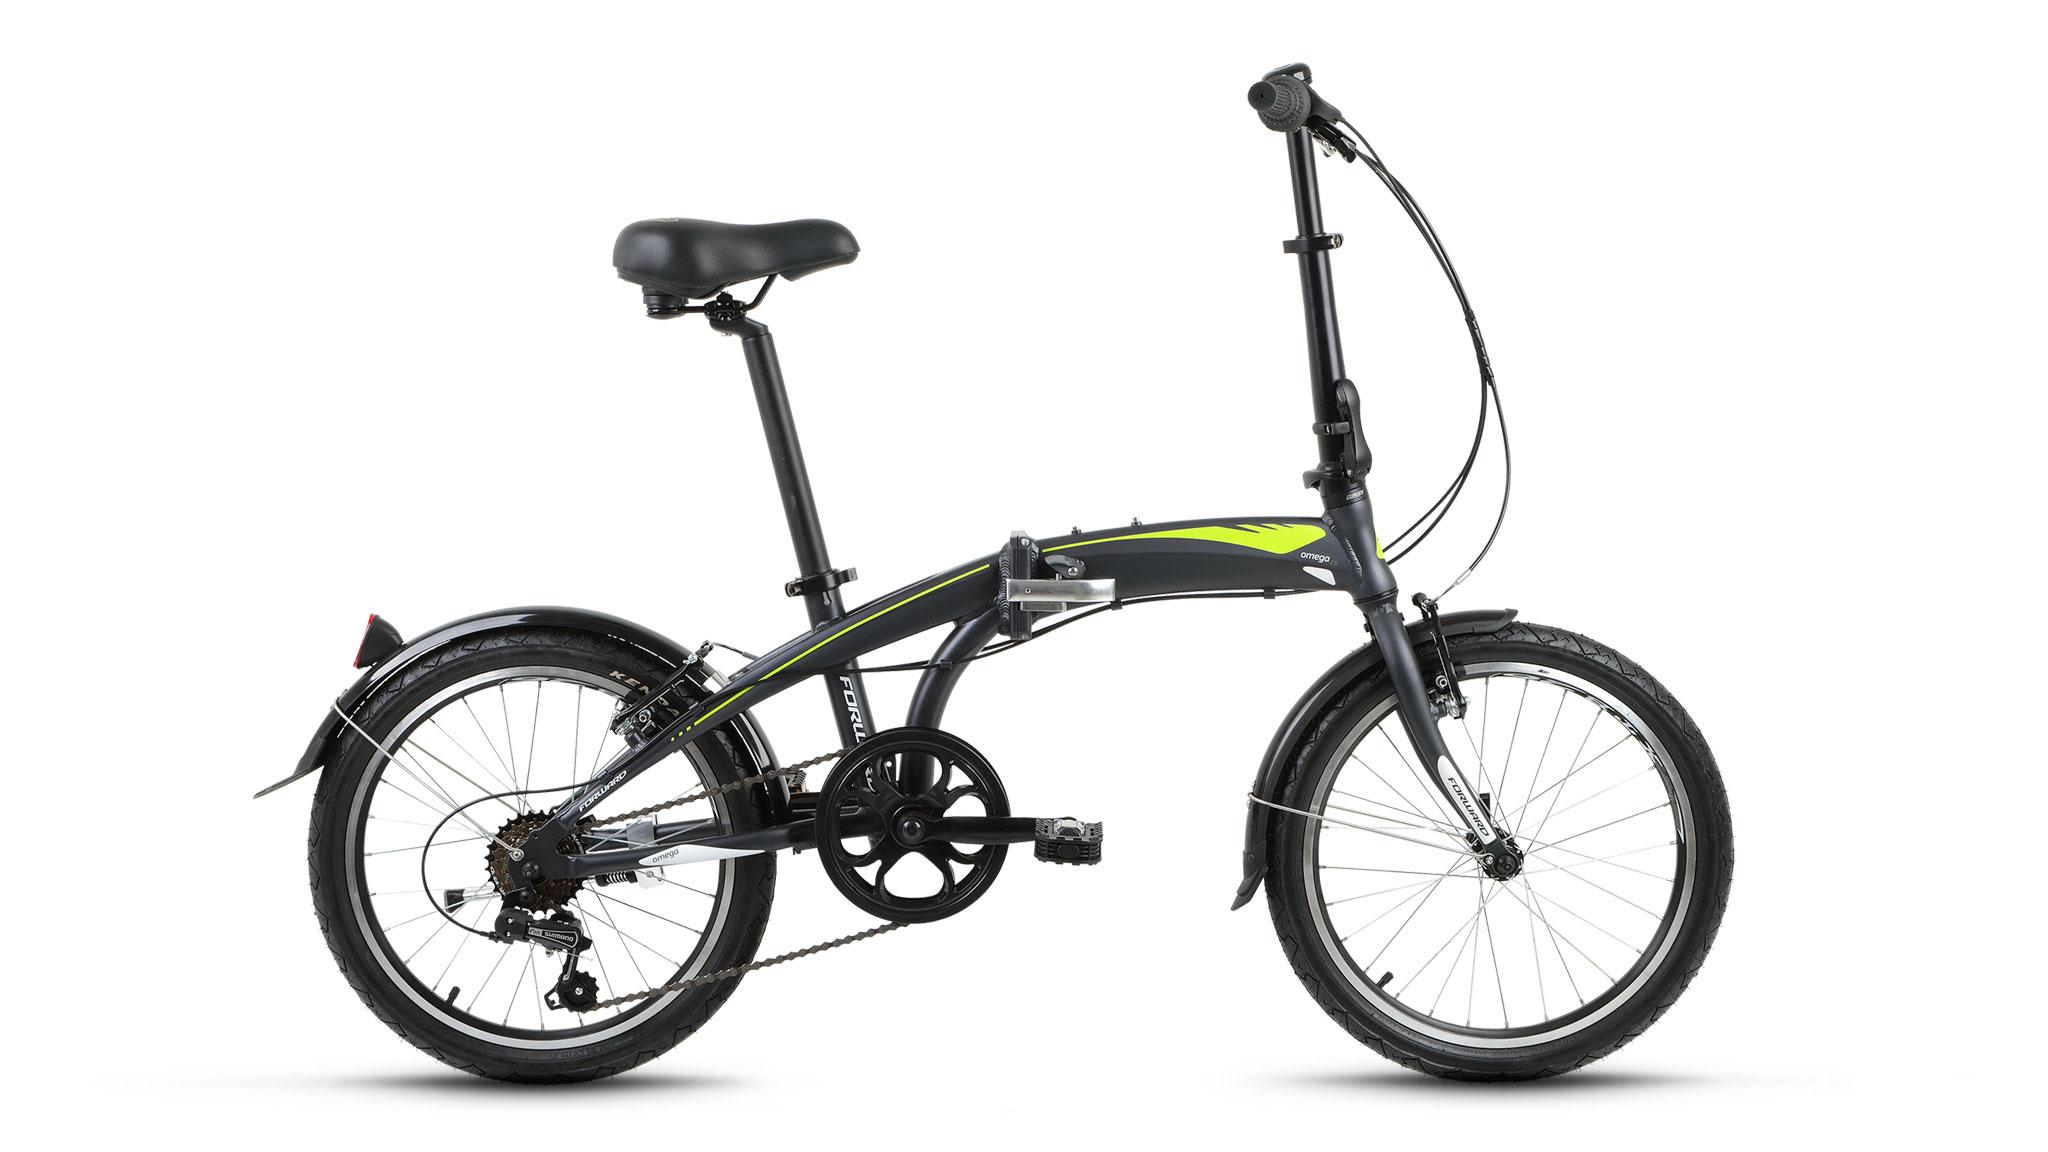 Фото Велосипед Forward Omega 2.0 (2017) зеленый 12